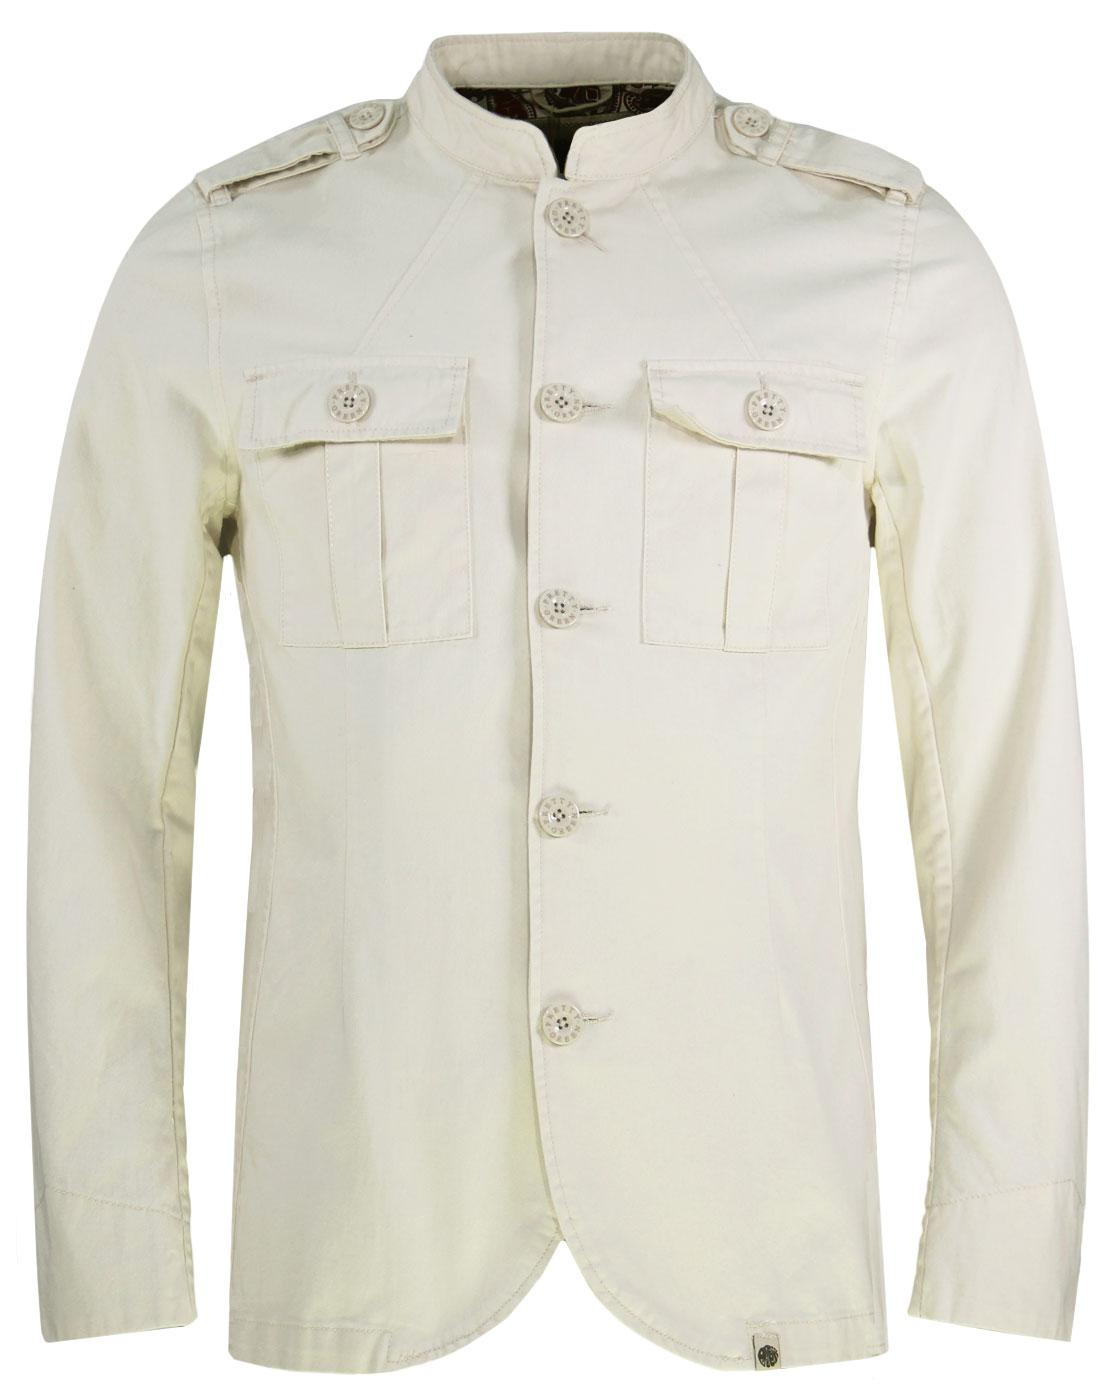 Langford PRETTY GREEN Mod Military Twill Jacket S